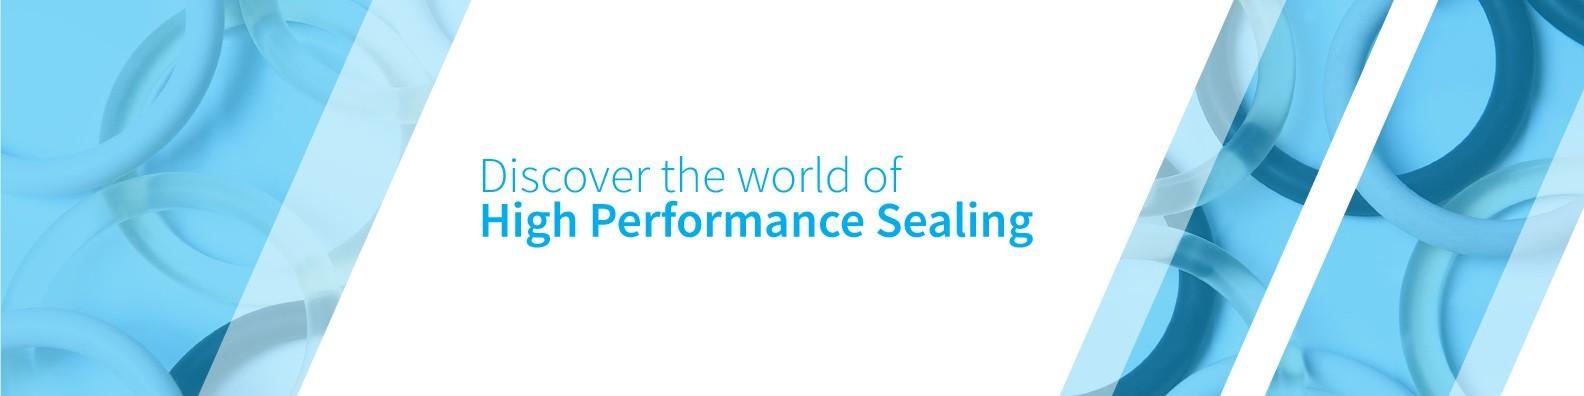 Precision Polymer Engineering Limited | LinkedIn